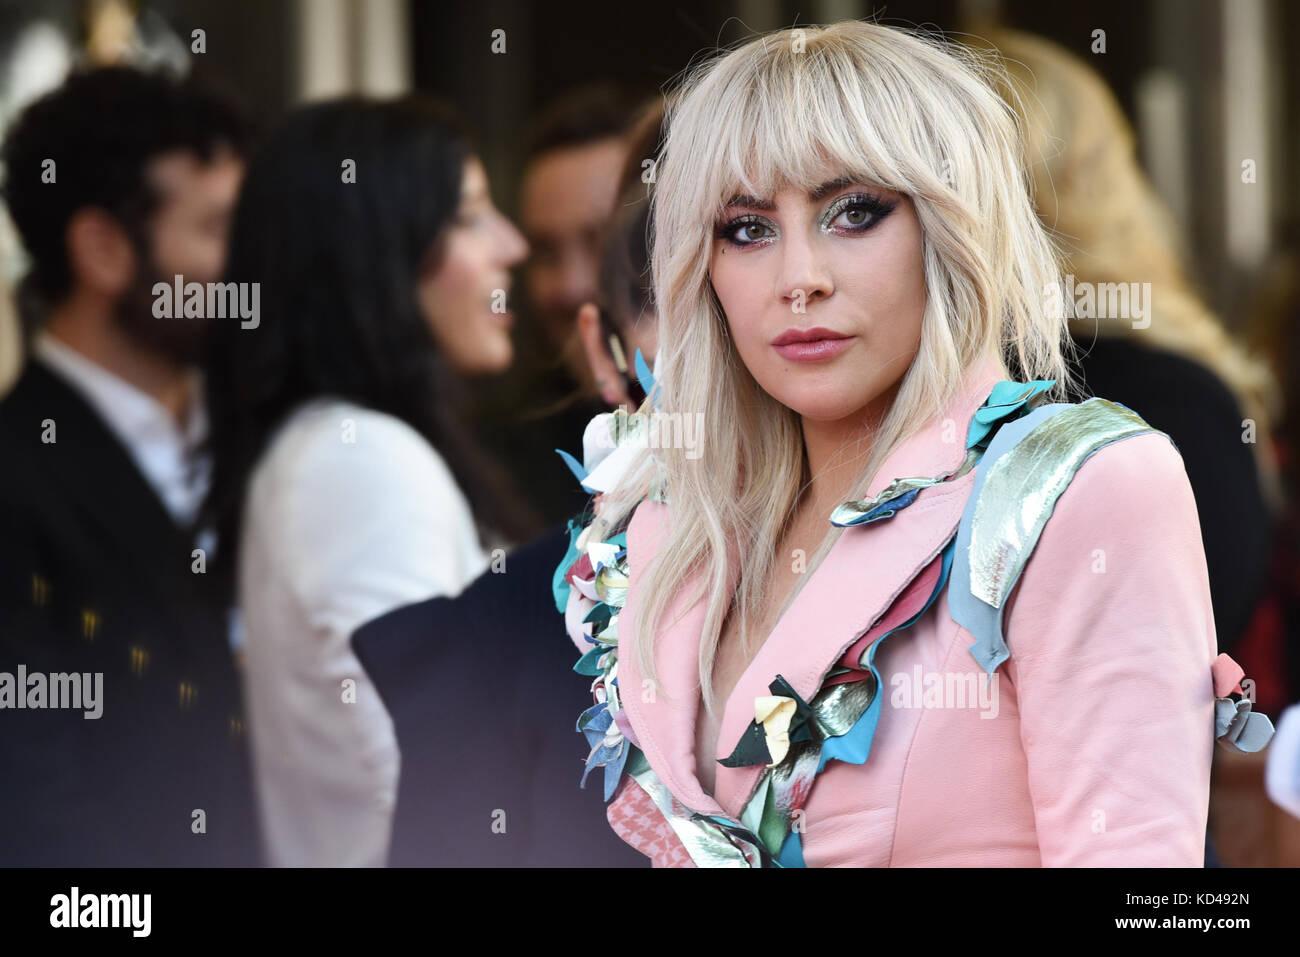 Xlii festival internacional de Cinema de Toronto - photocall Lady Gaga apresentando: Lady Gaga onde: toronto, Canadá Imagens de Stock